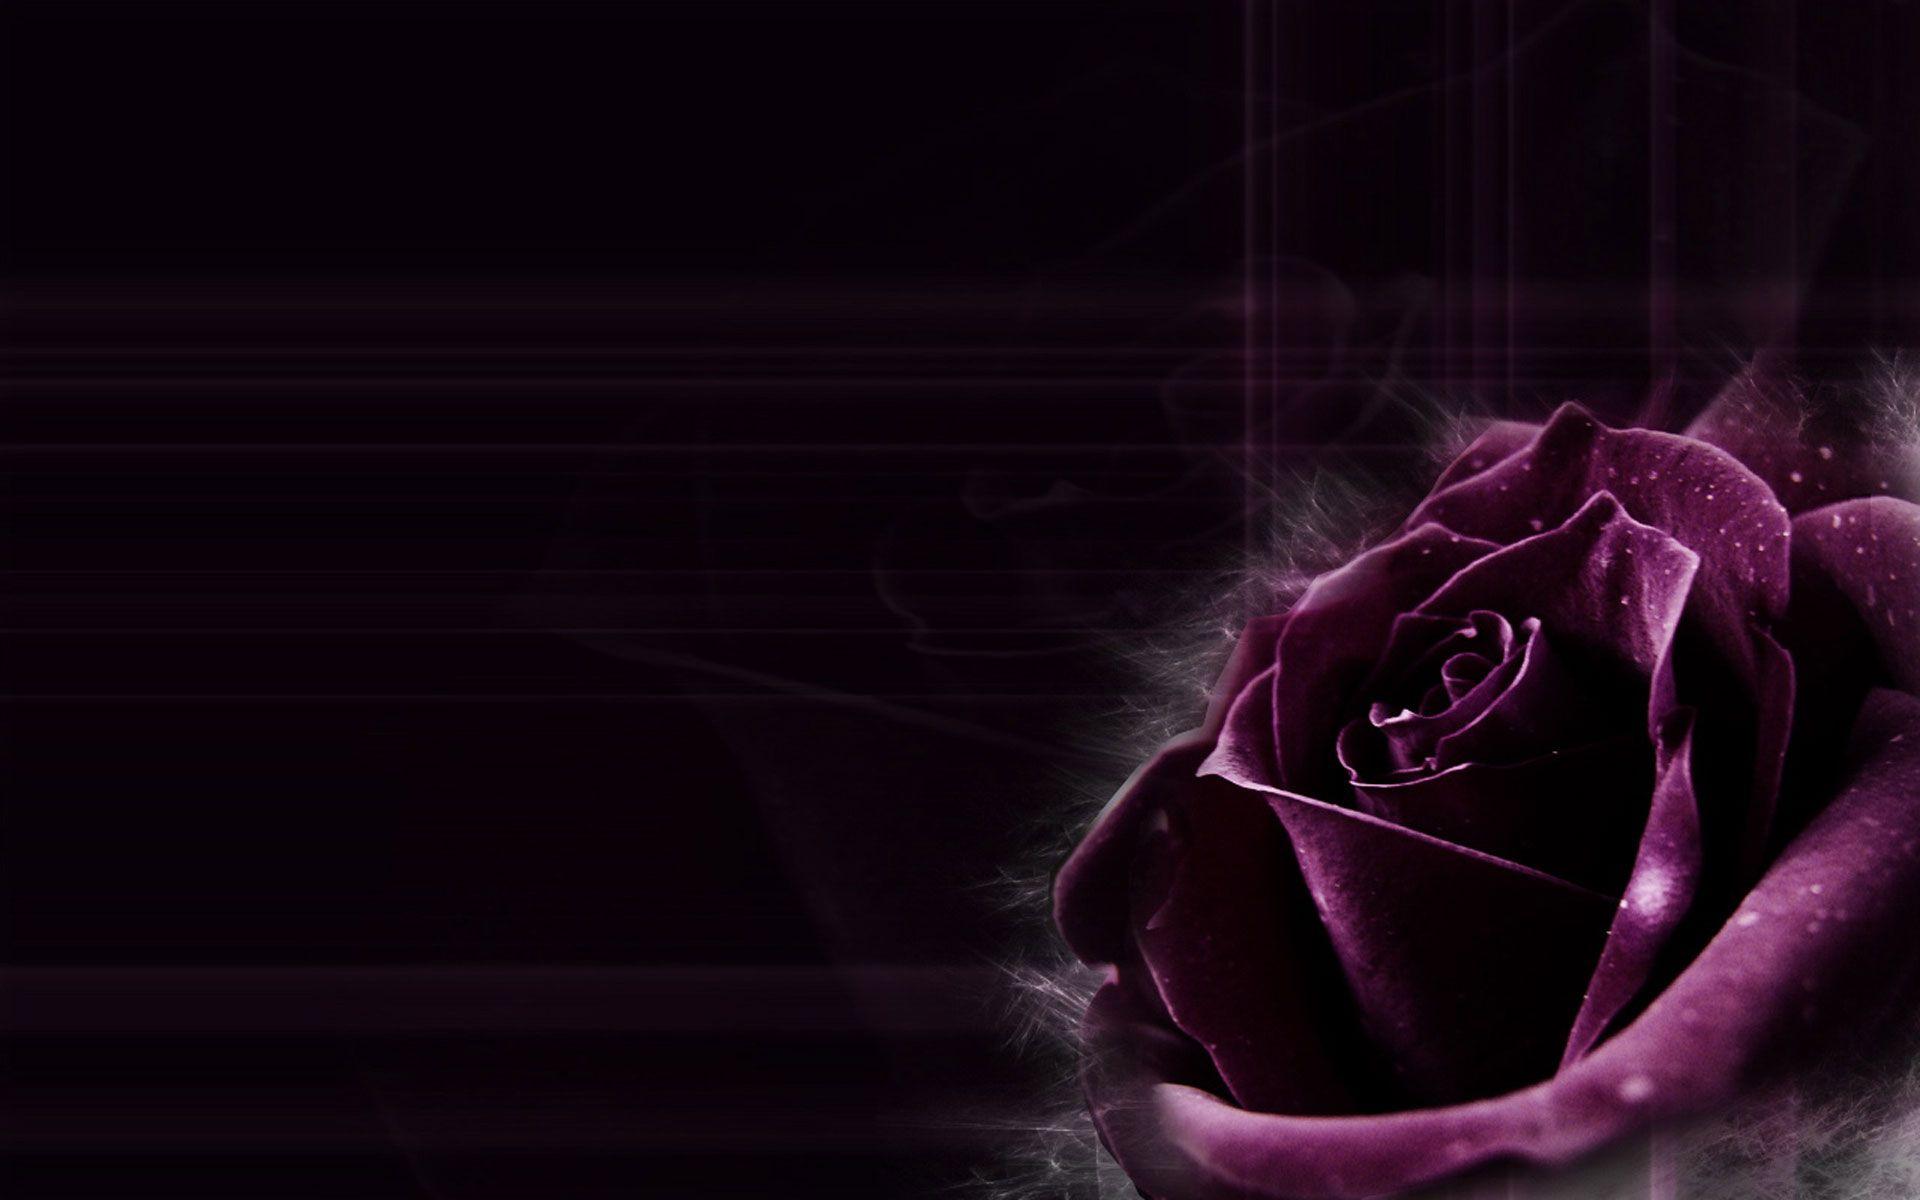 Dark Purple Rose Backgrounds Images Pictures Becuo Purple Wallpaper Black Roses Wallpaper Purple Roses